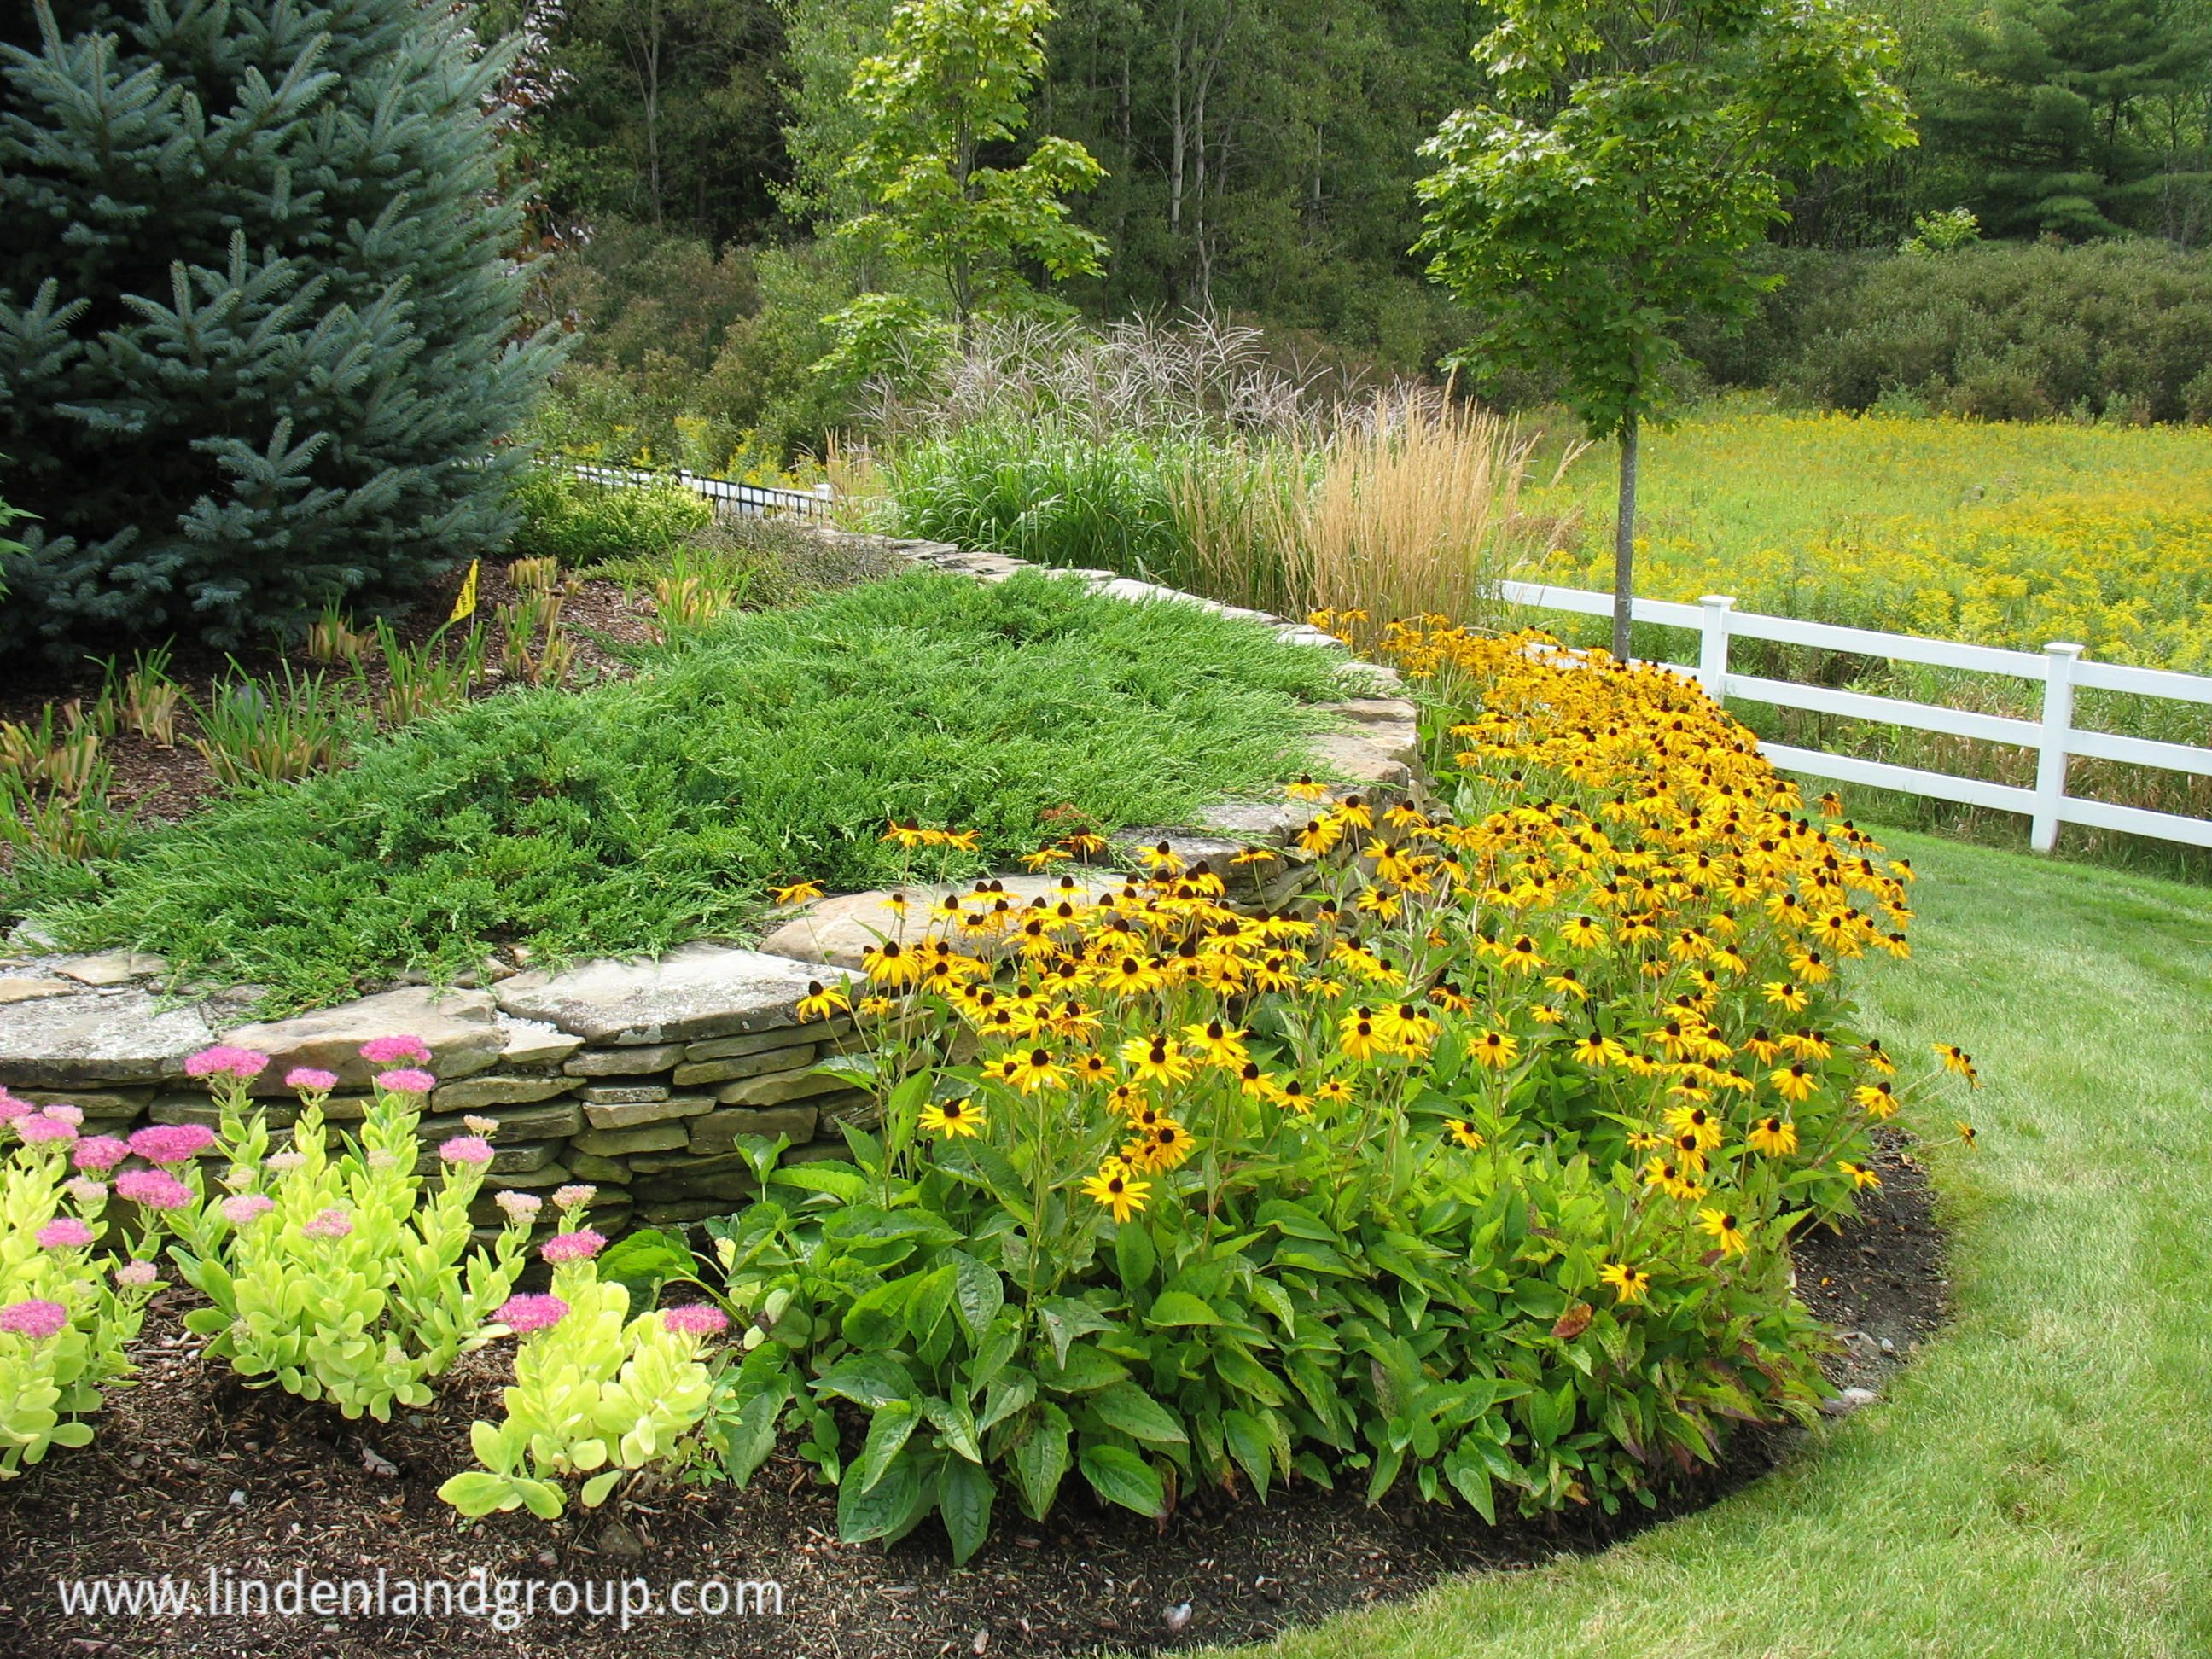 Sustainable Landscape Contractor Serving Burlington Vt Area Organic Native Plants Stone Full Sun Garden Small Garden Ideas Full Sun Small Gardens